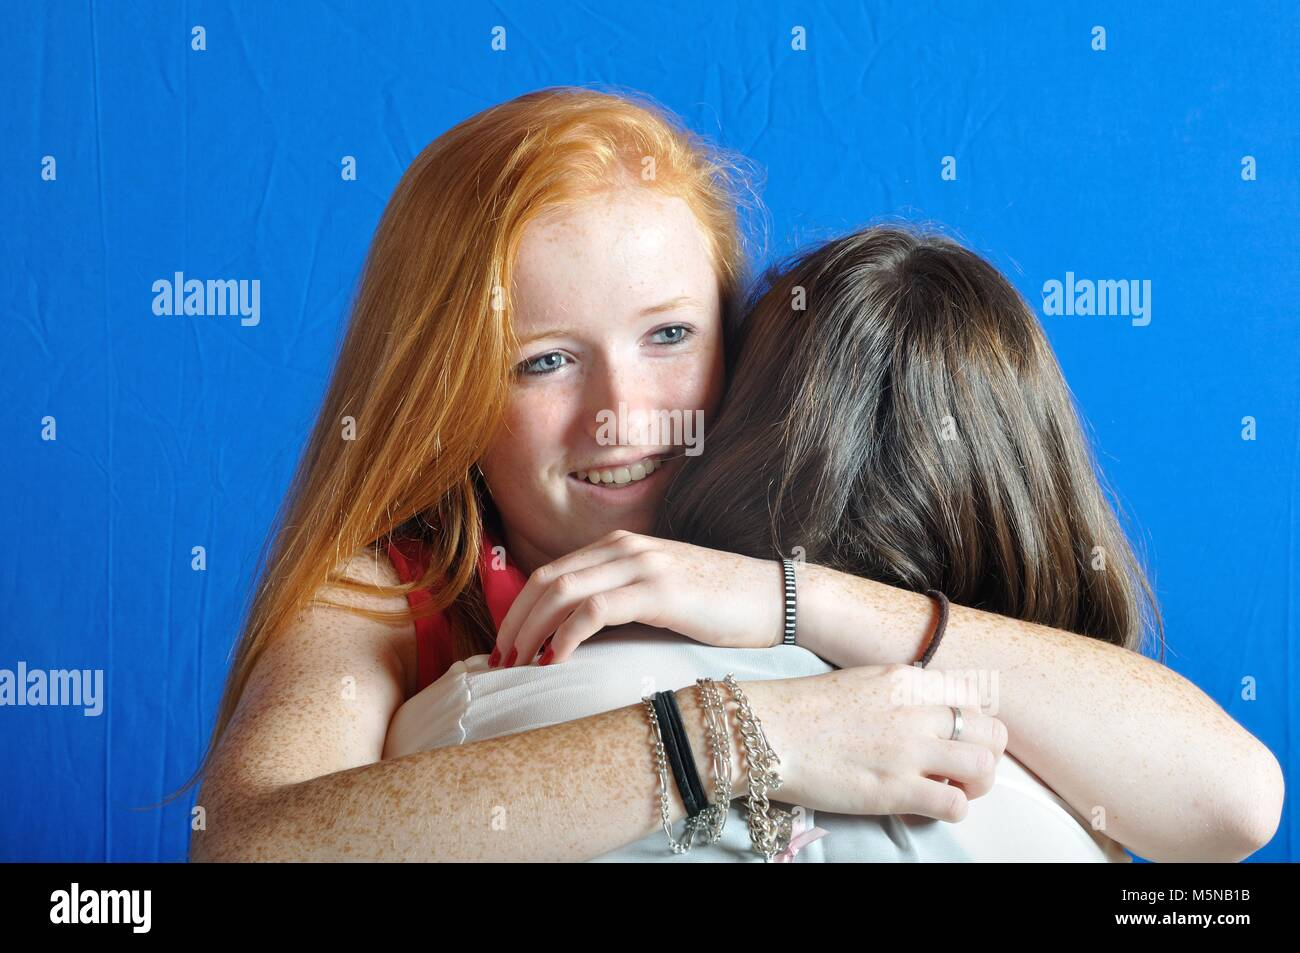 Deux amis adolescents, serrant les uns les autres Photo Stock